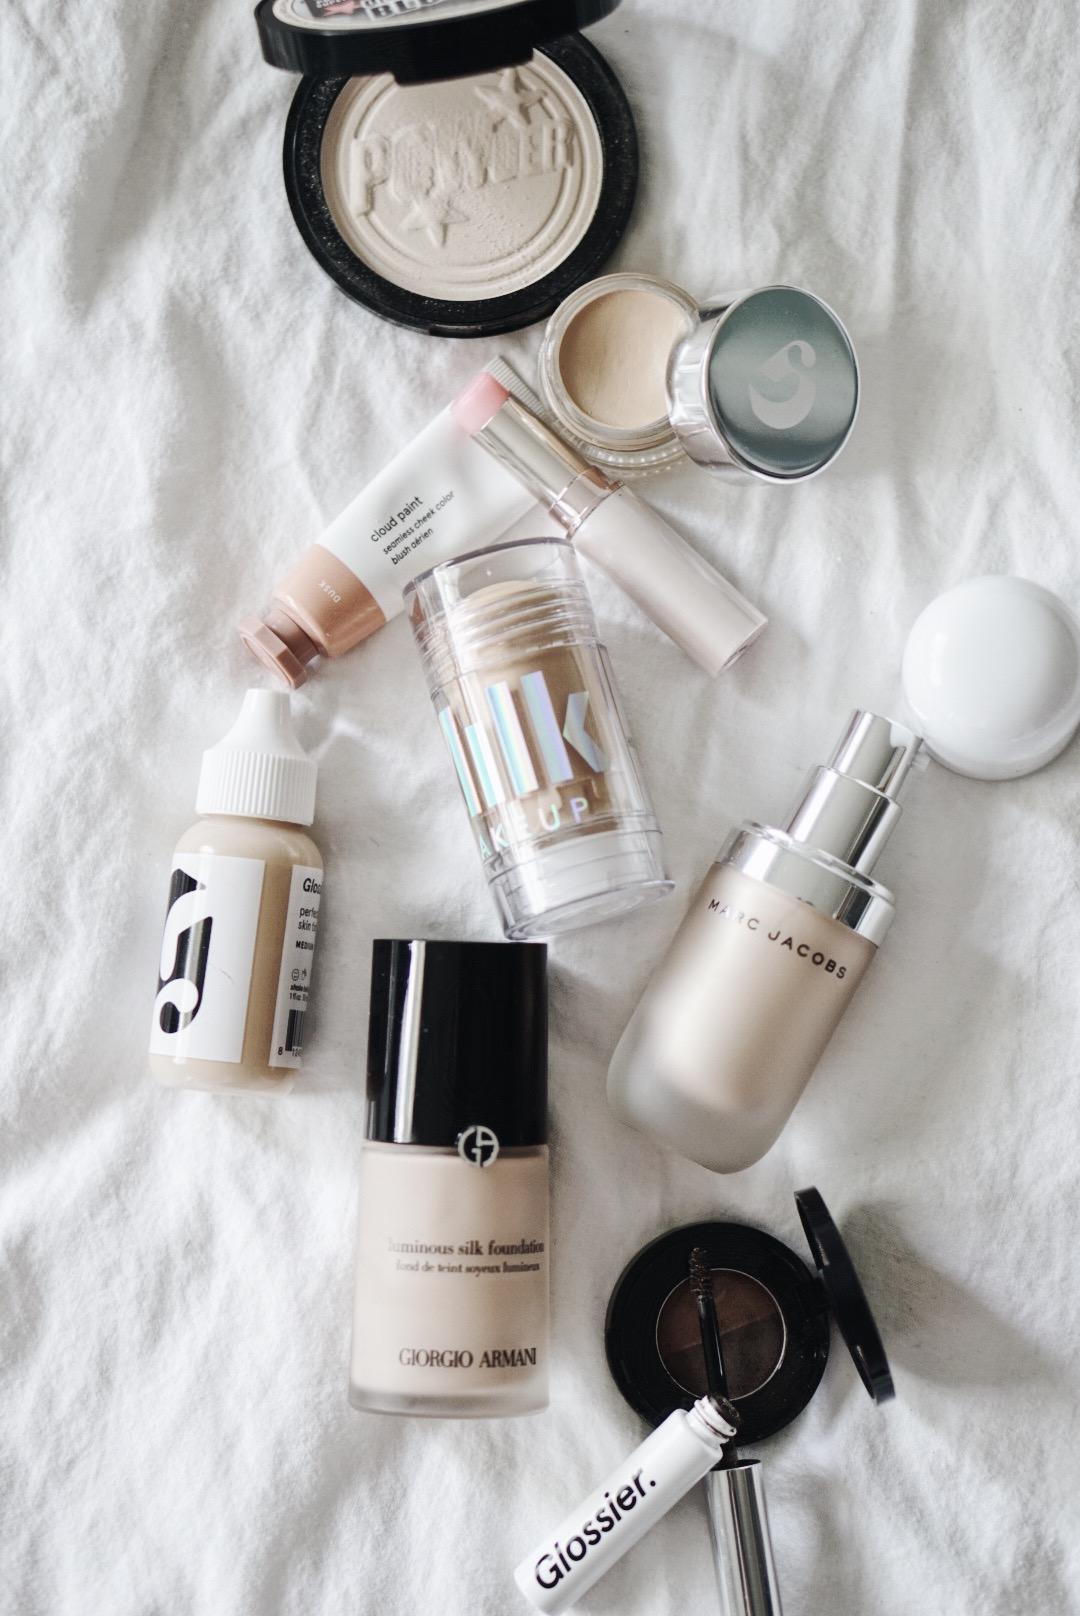 Makeup Edit Current Everyday Face S S17 C I N D Y H Y U E